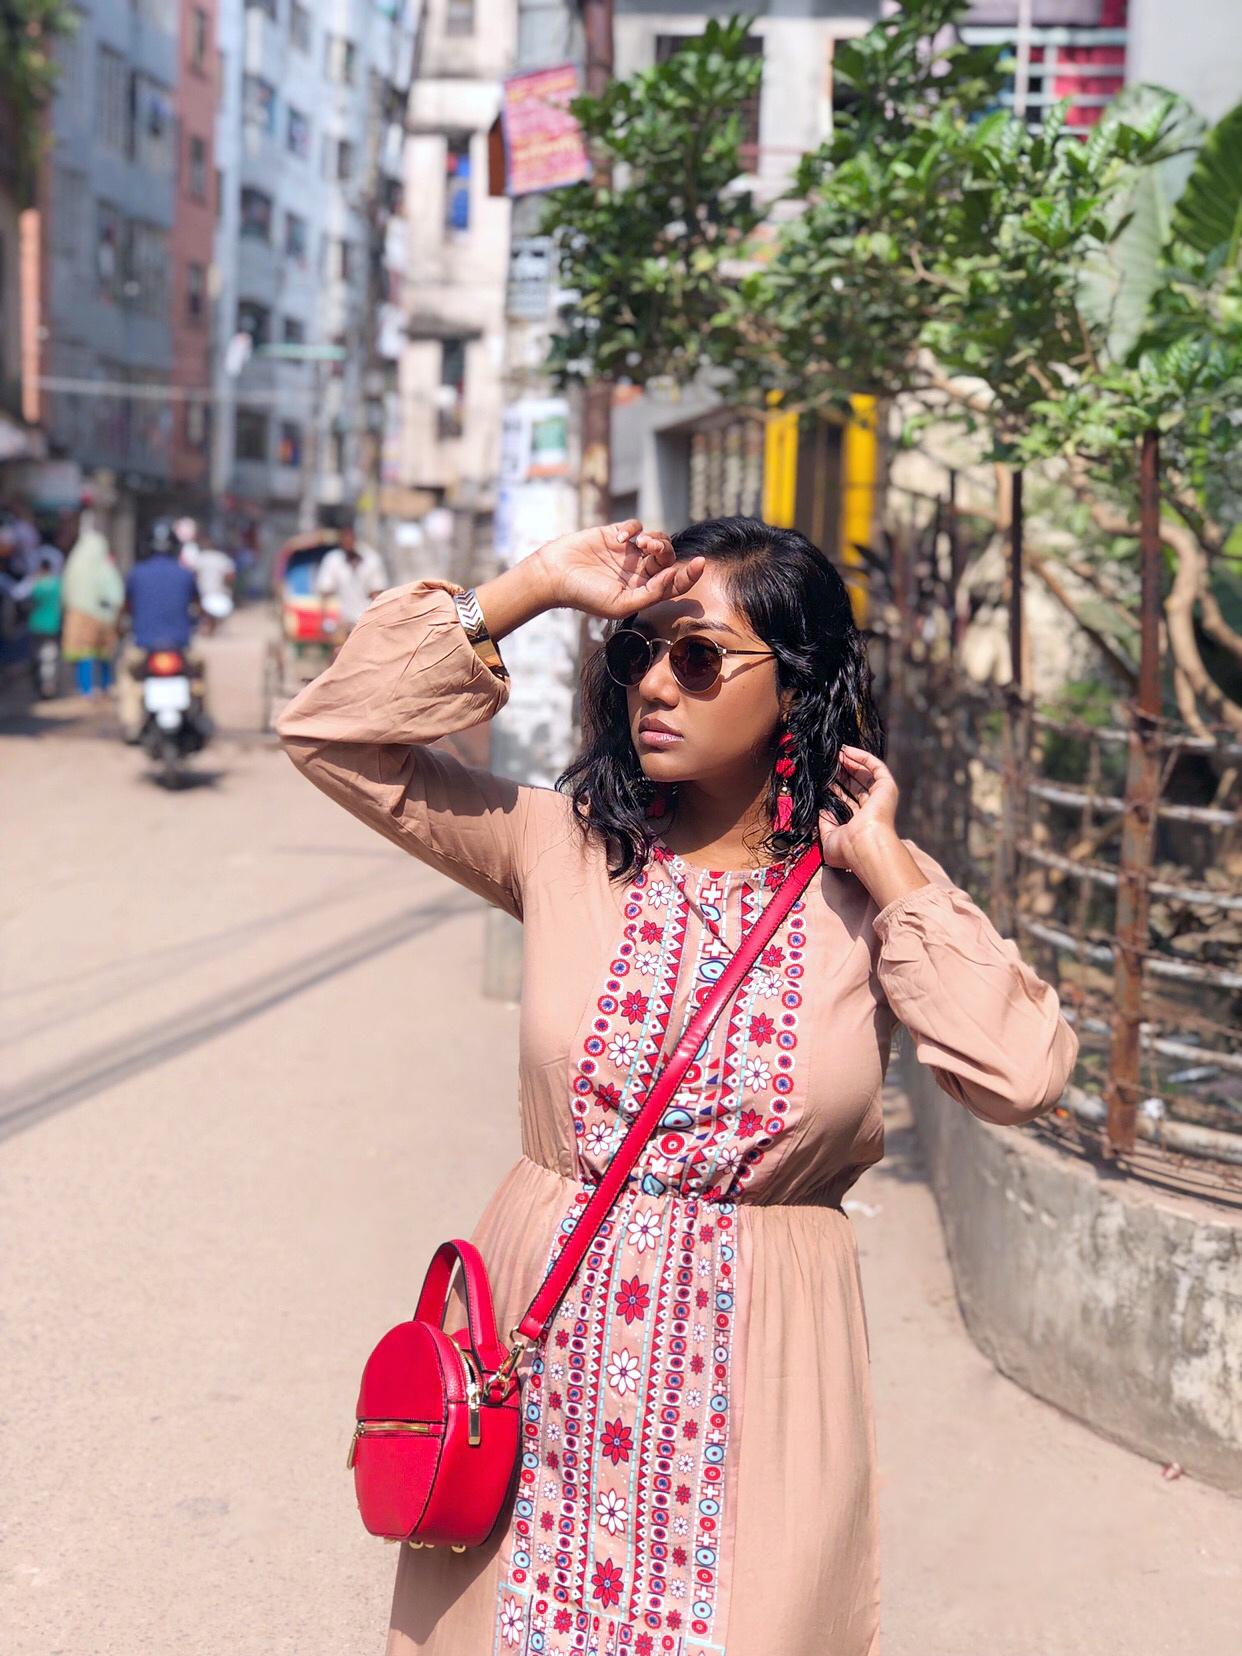 Here's-Why-you-Should-Visit-Bangladesh's-Capital-Dhaka